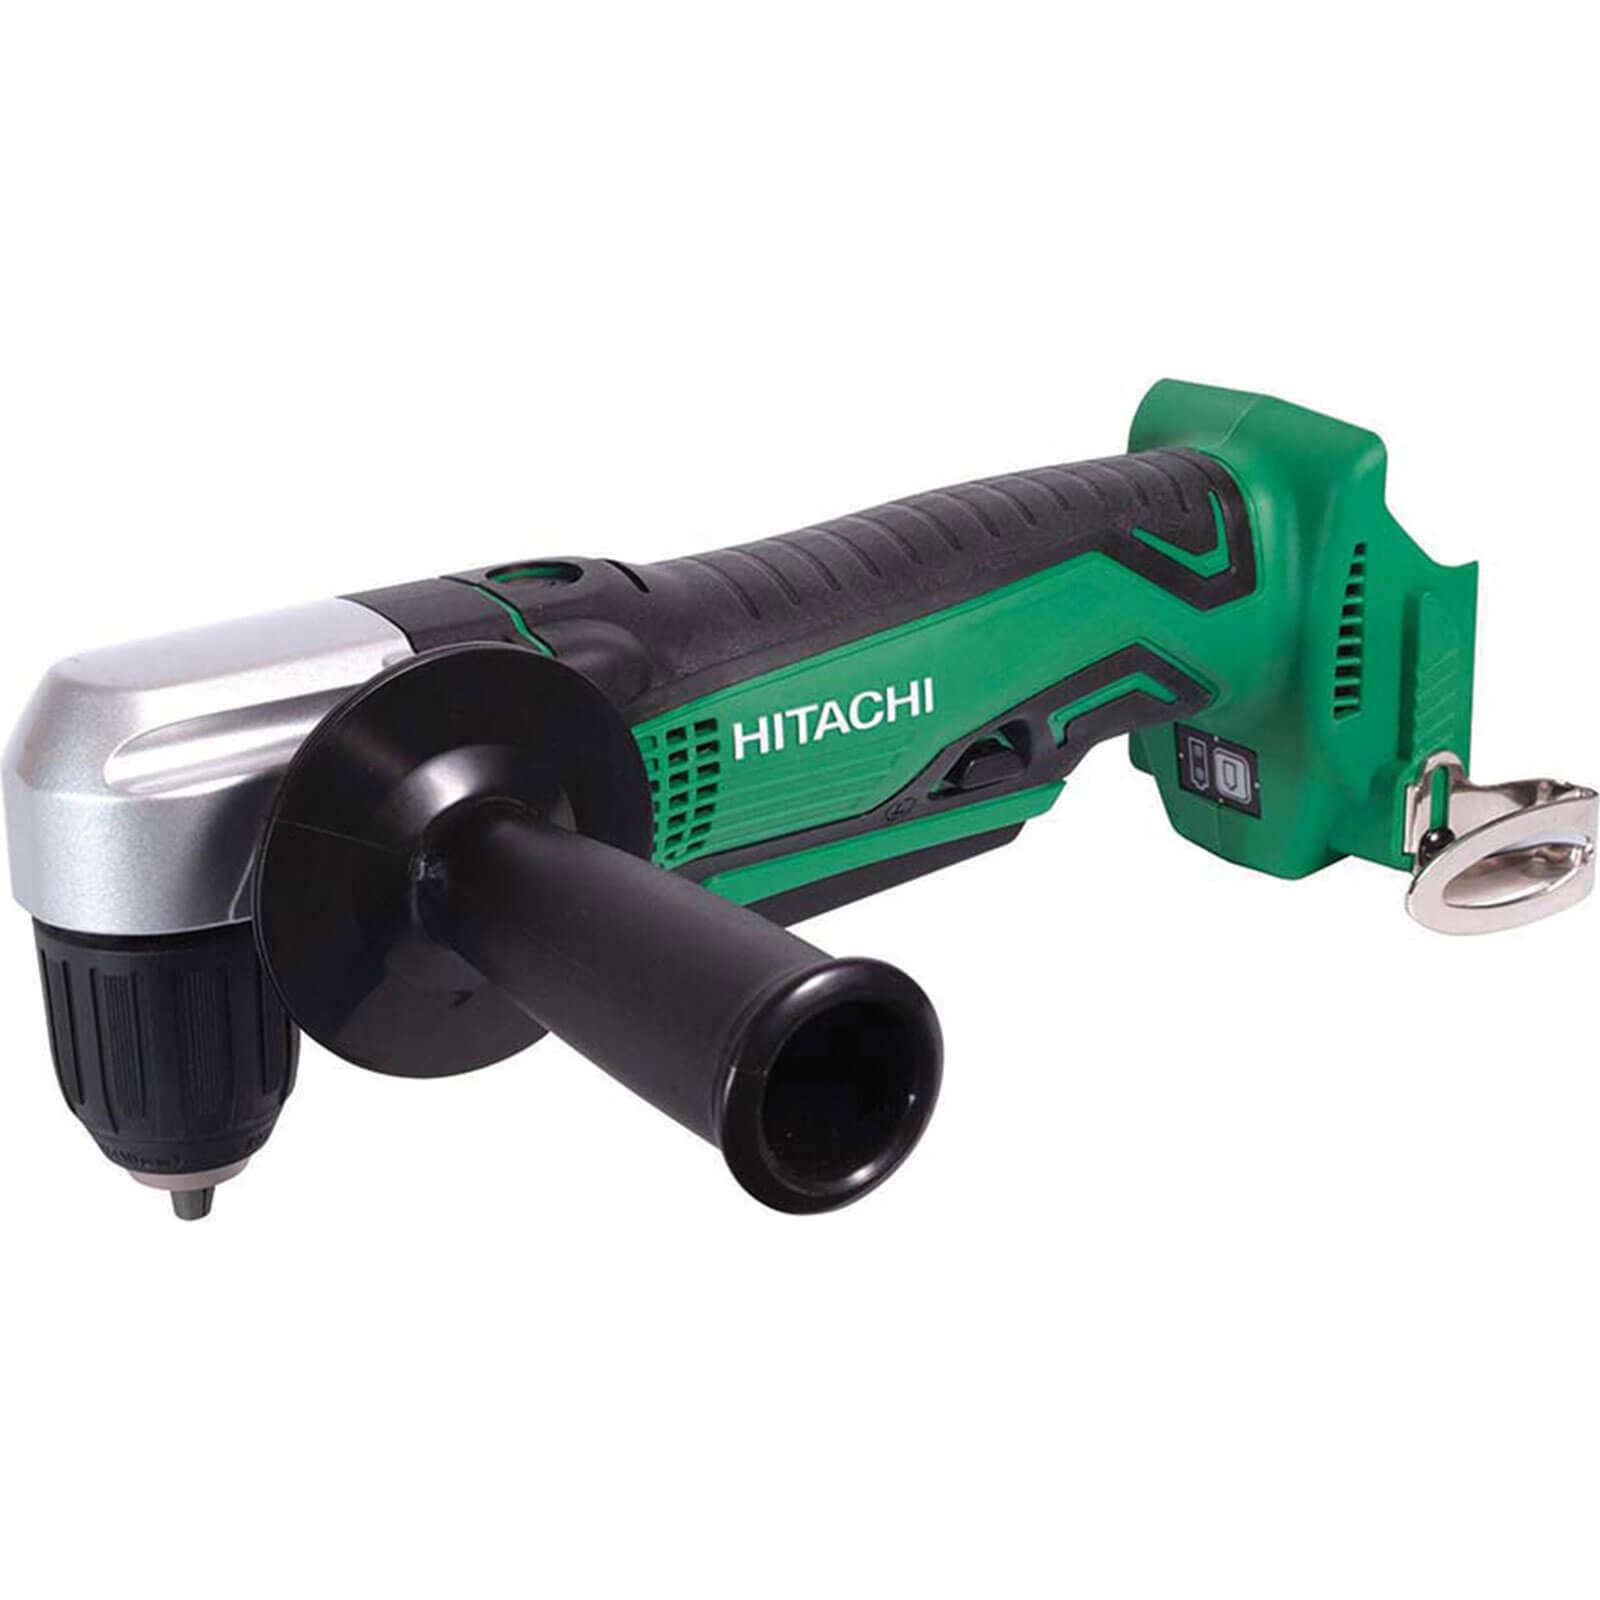 Image of Hitachi DN18DSL 18v Cordless Angle Drill No Batteries No Charger No Case